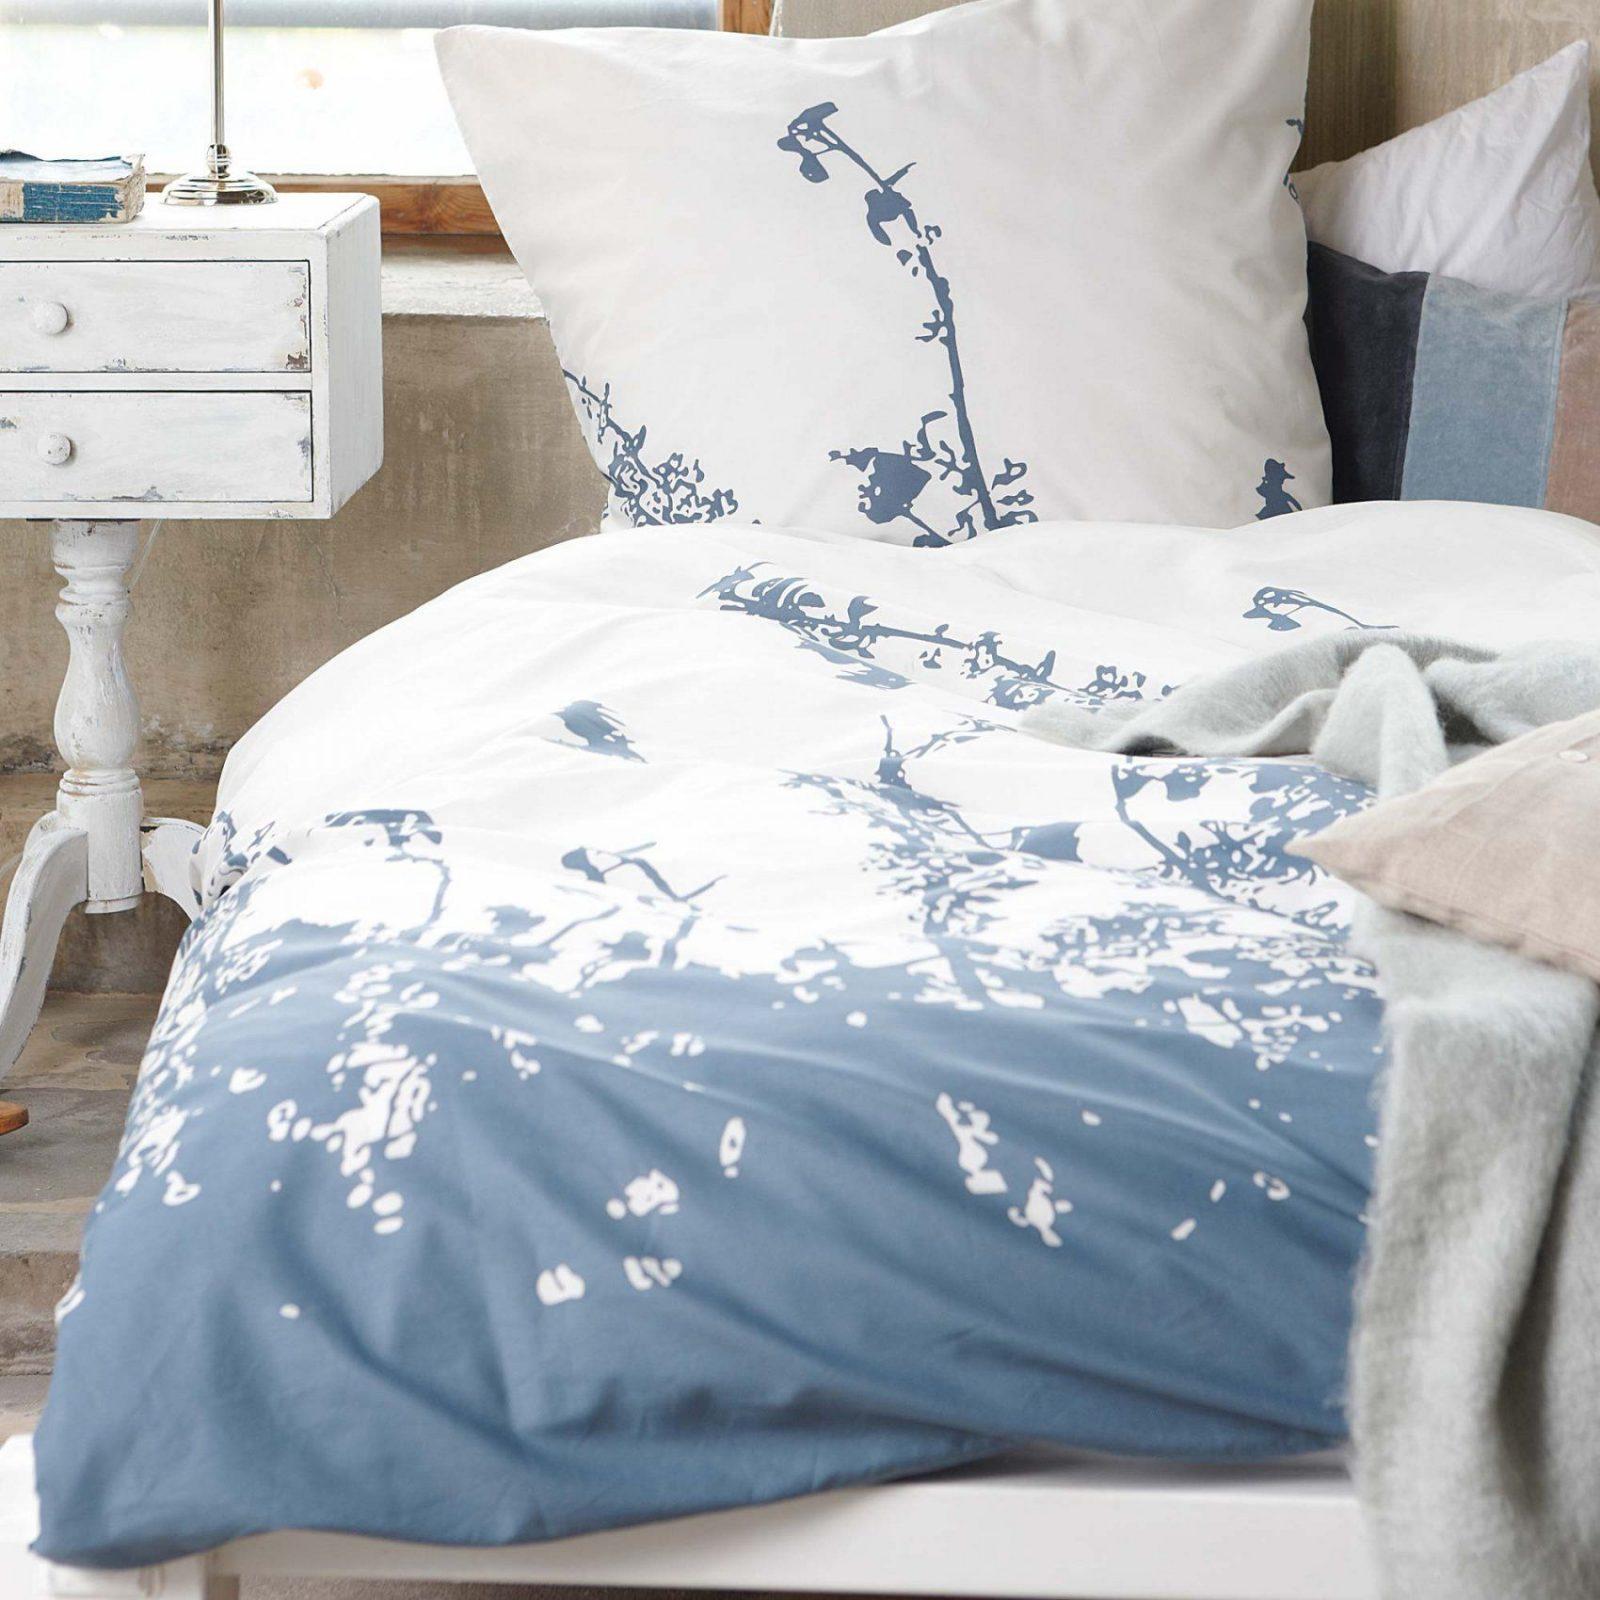 Perfekt Biber Bettwäsche Selbst Gestalten  Bettwäsche Ideen von Bettwäsche Selbst Designen Bild